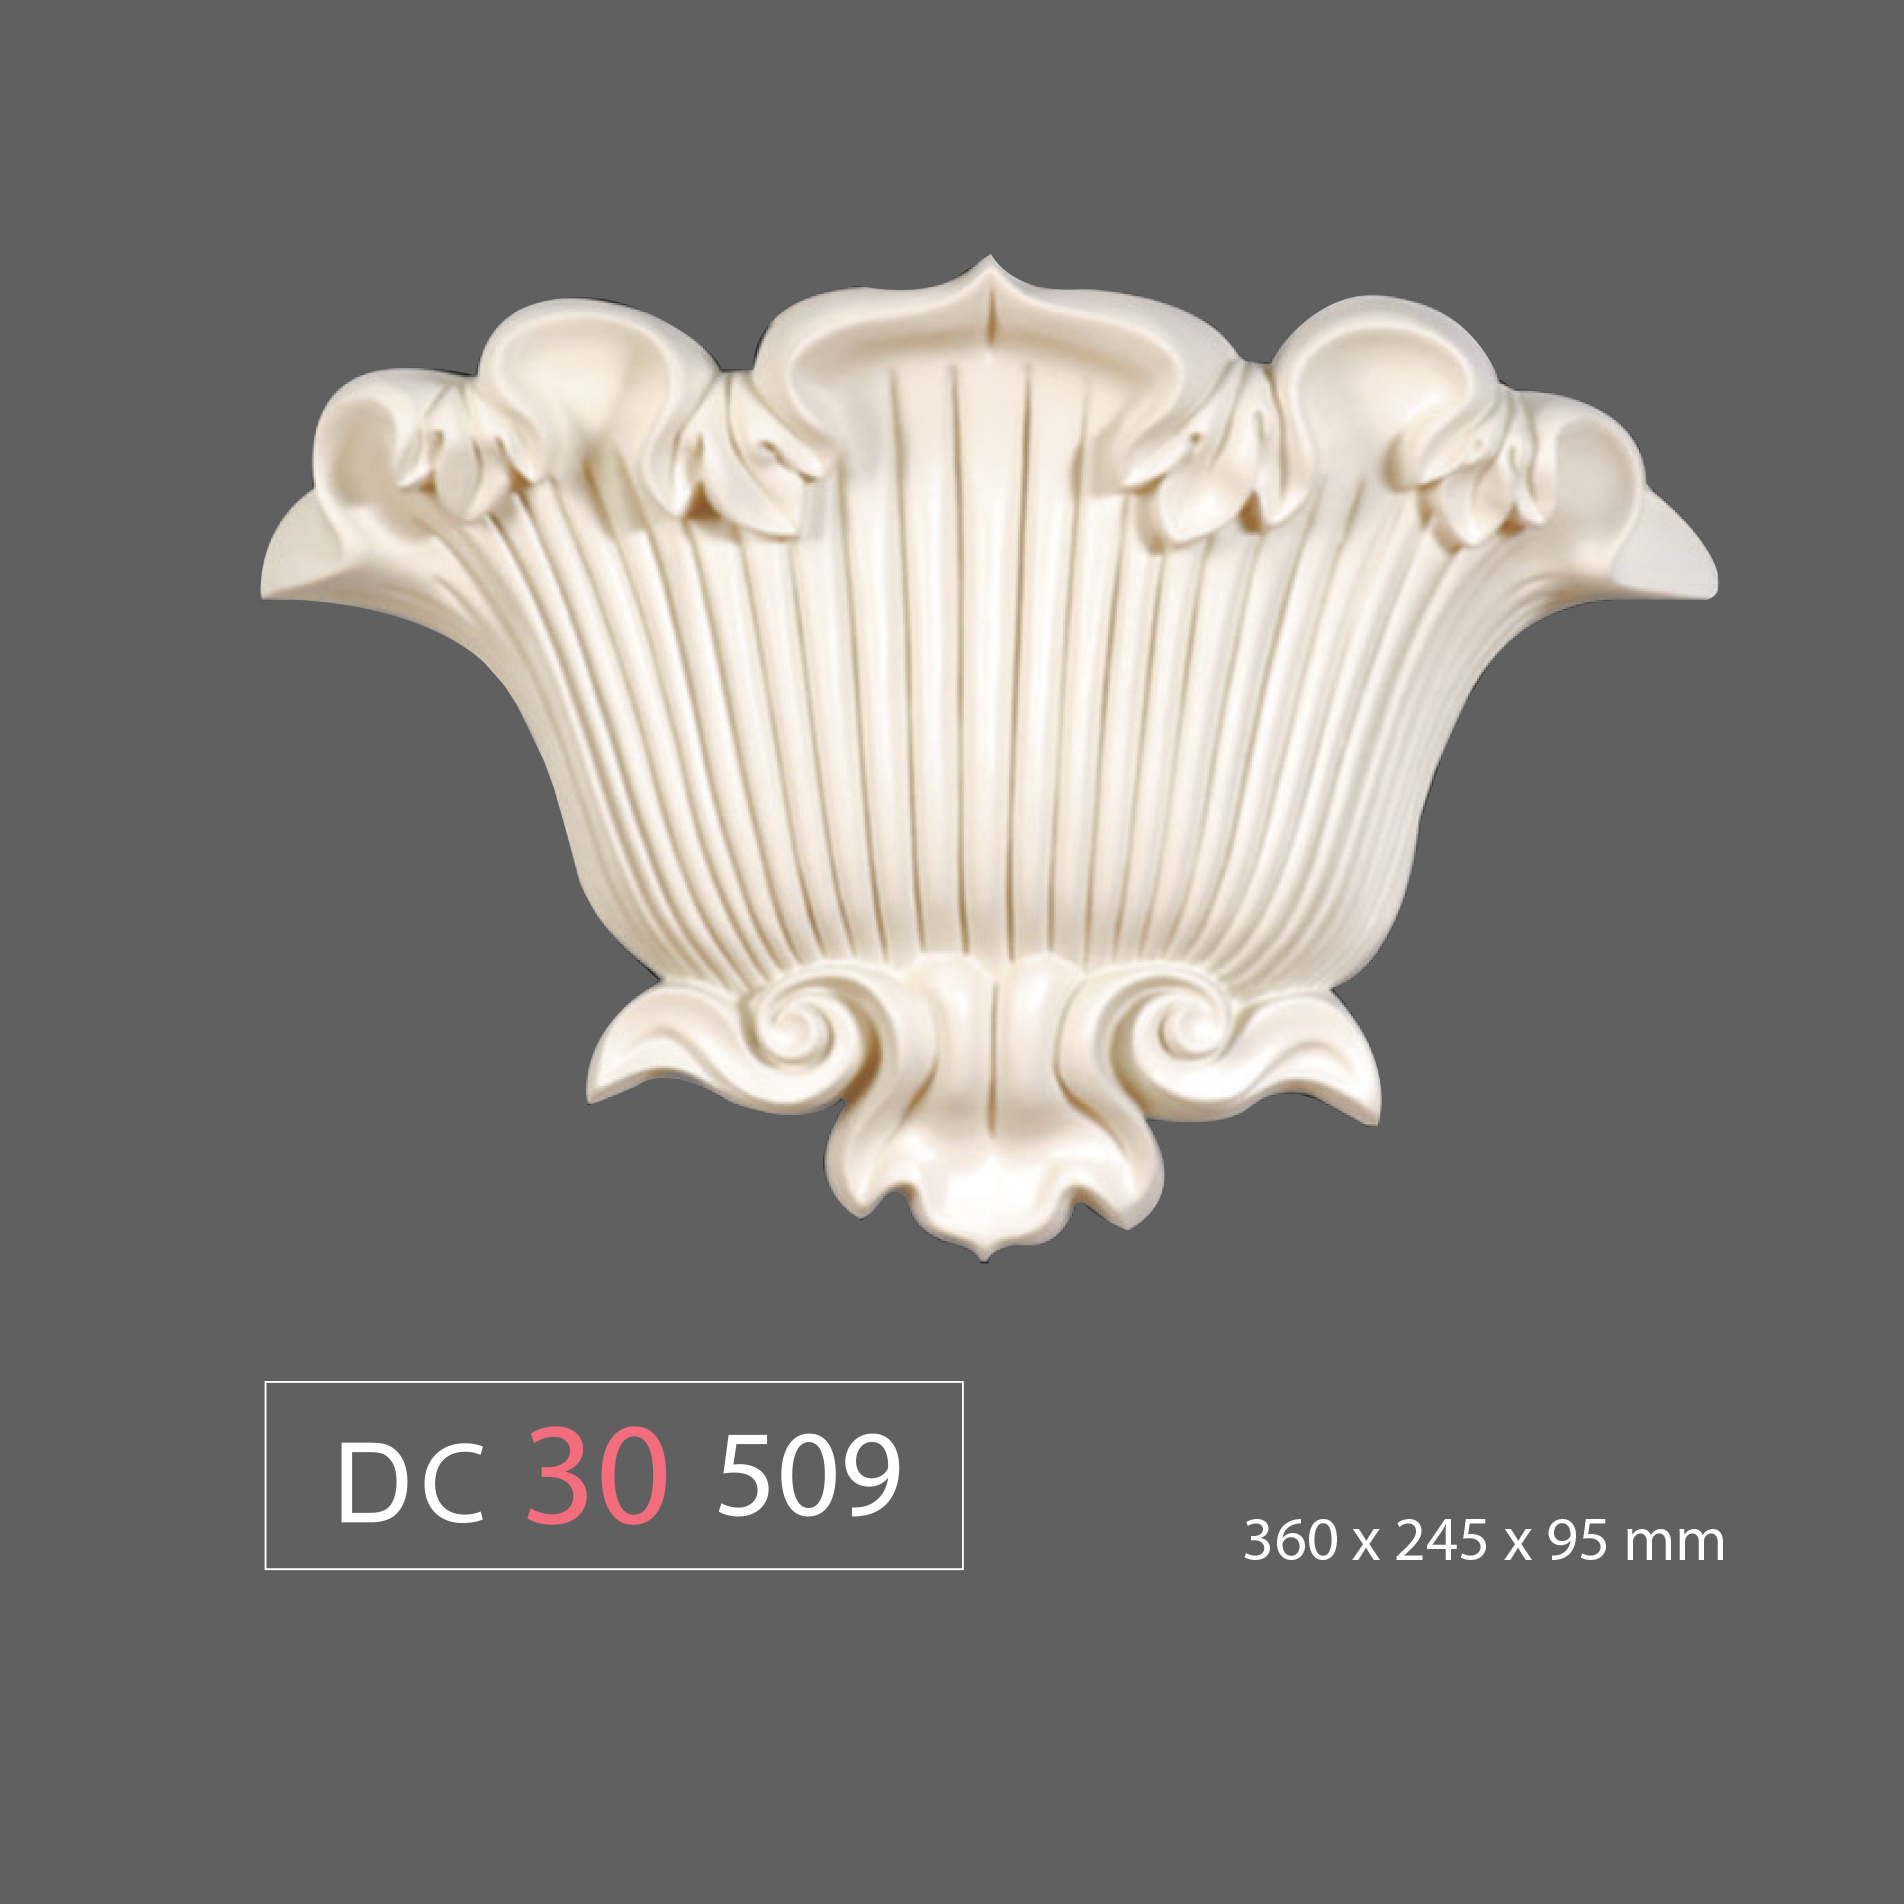 DC30 509